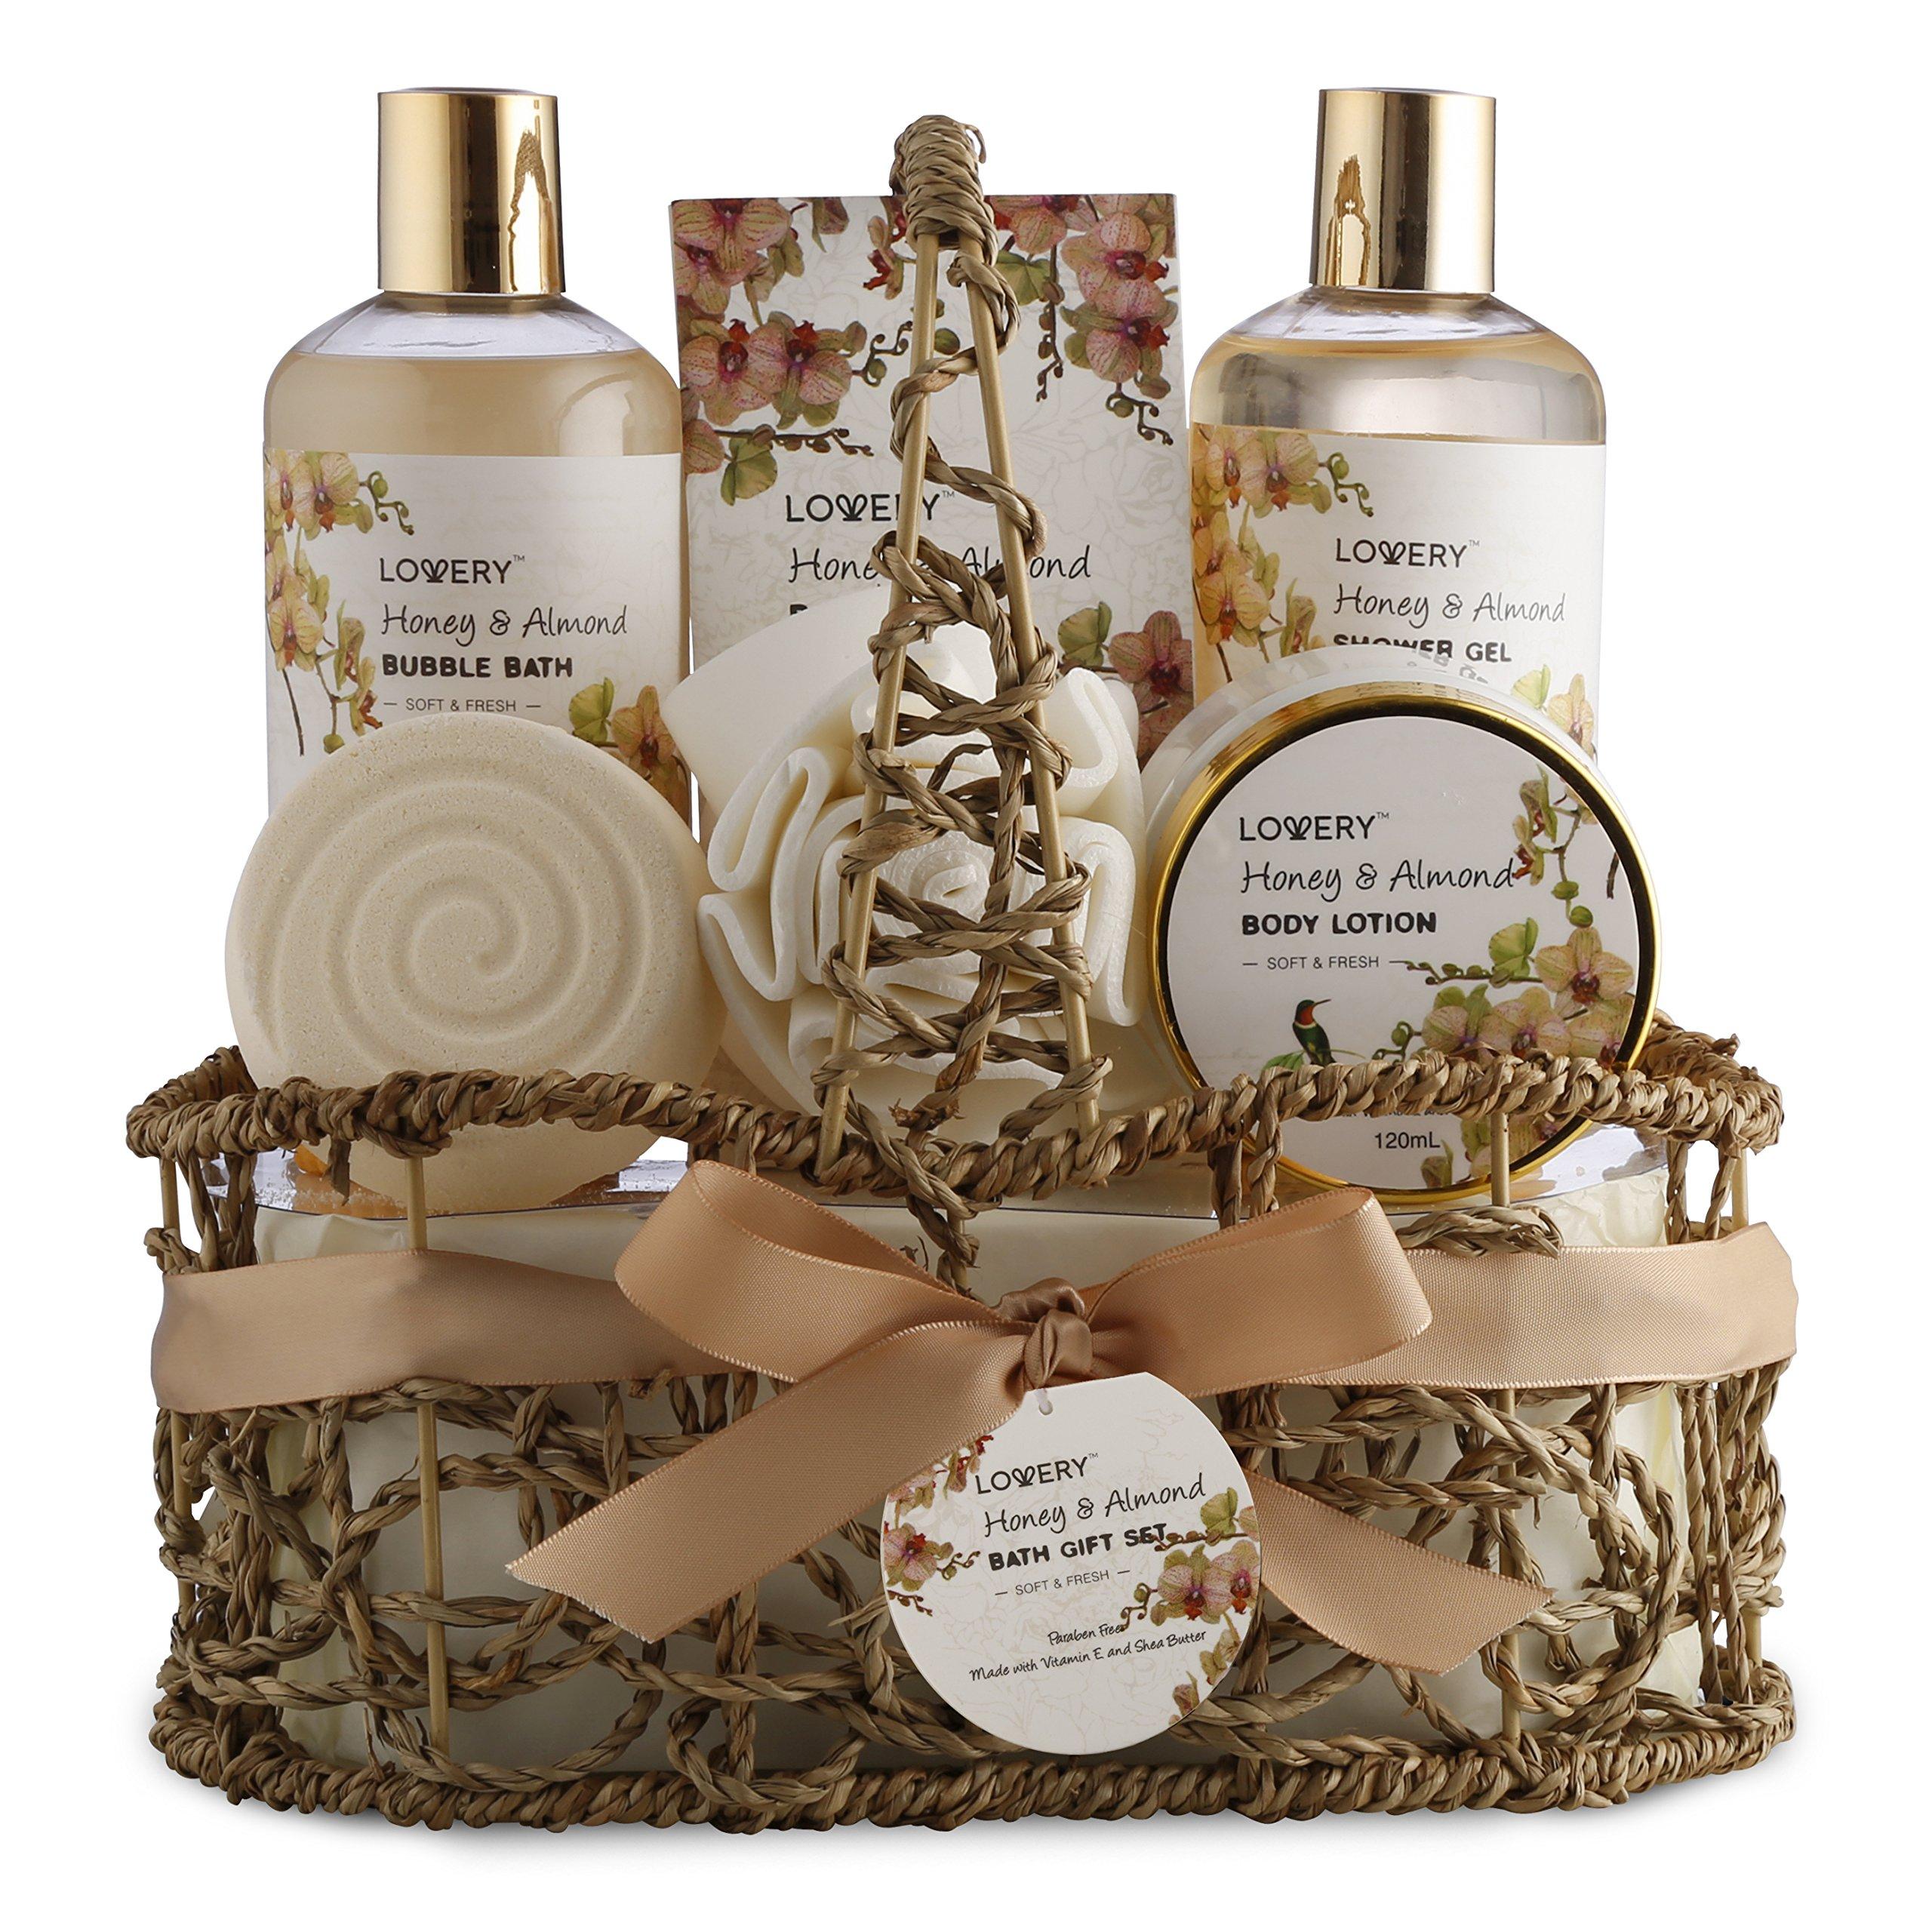 Home Spa Gift Basket - Honey & Almond Scent - Luxury Bath & Body Set For Women and Men - Contains Shower Gel, Bubble Bath, Body Lotion, Bath Salt, Bath Bomb, Bath Puff & Handmade Weaved Basket